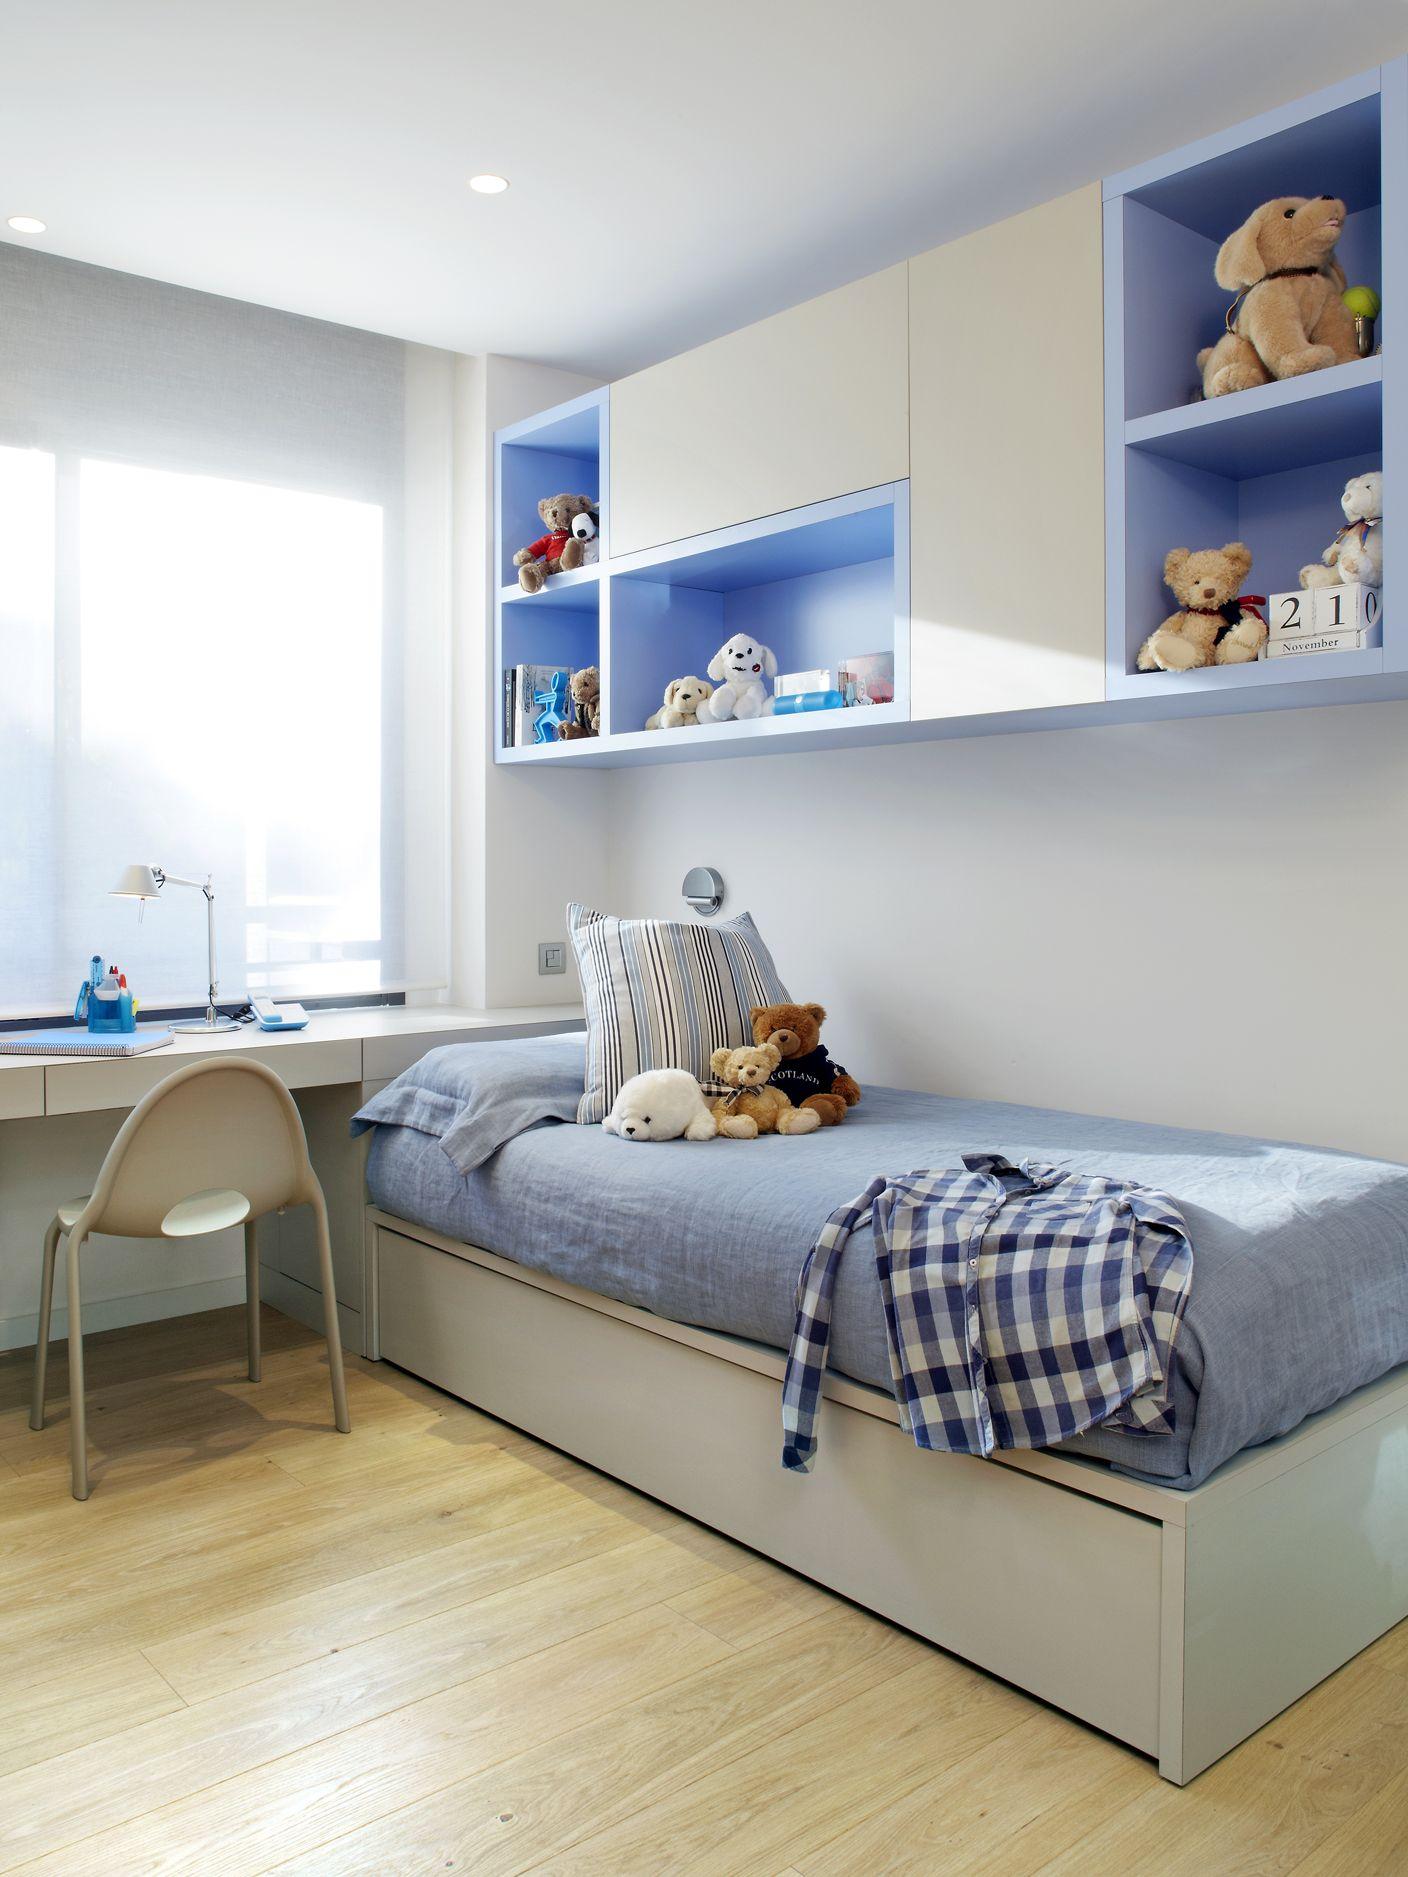 Molins interiors arquitectura interior interiorismo - Decoracion habitaciones juveniles nina ...